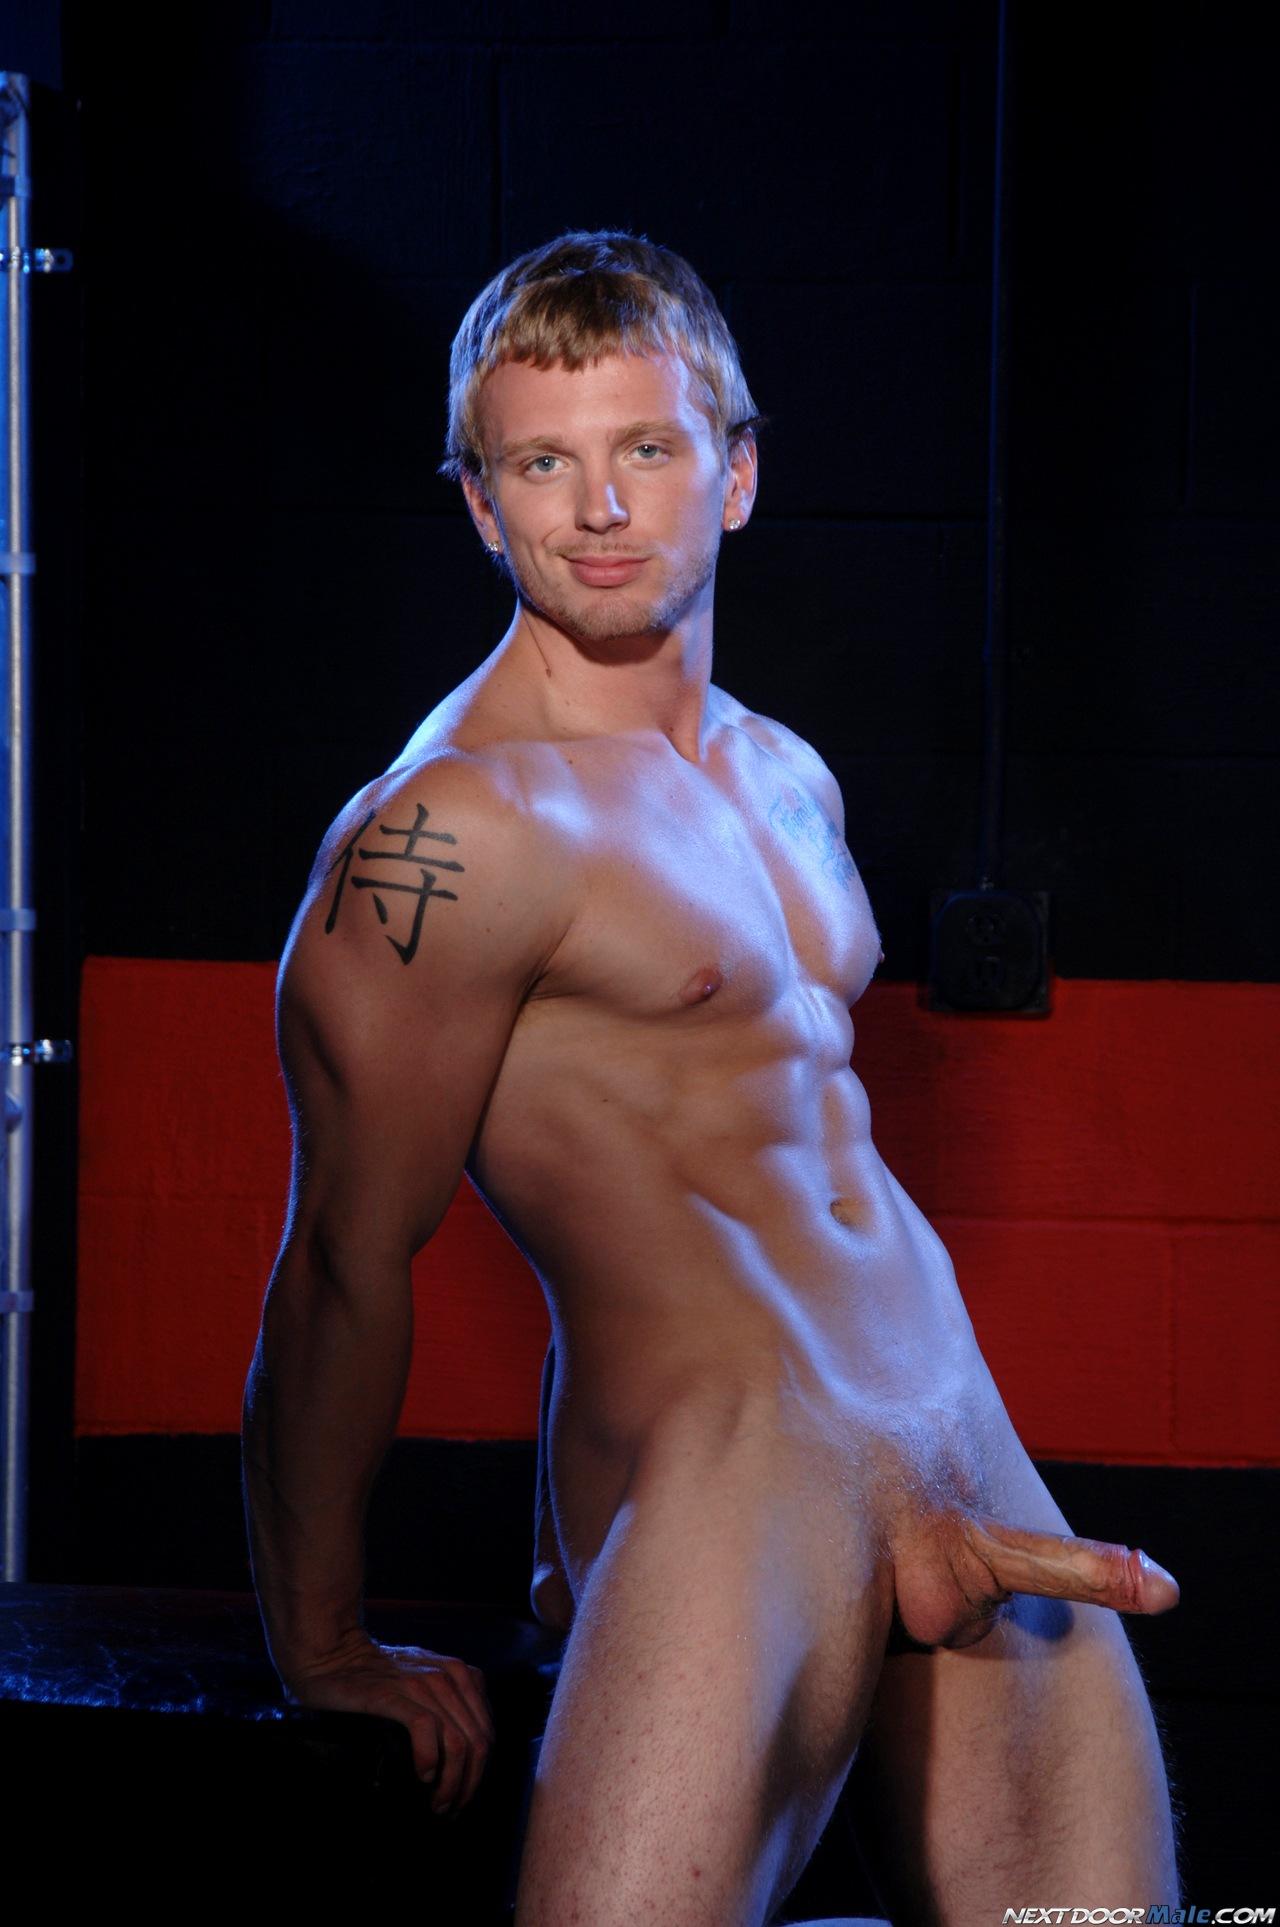 Free amateur nude male sleeping gay xxx 4